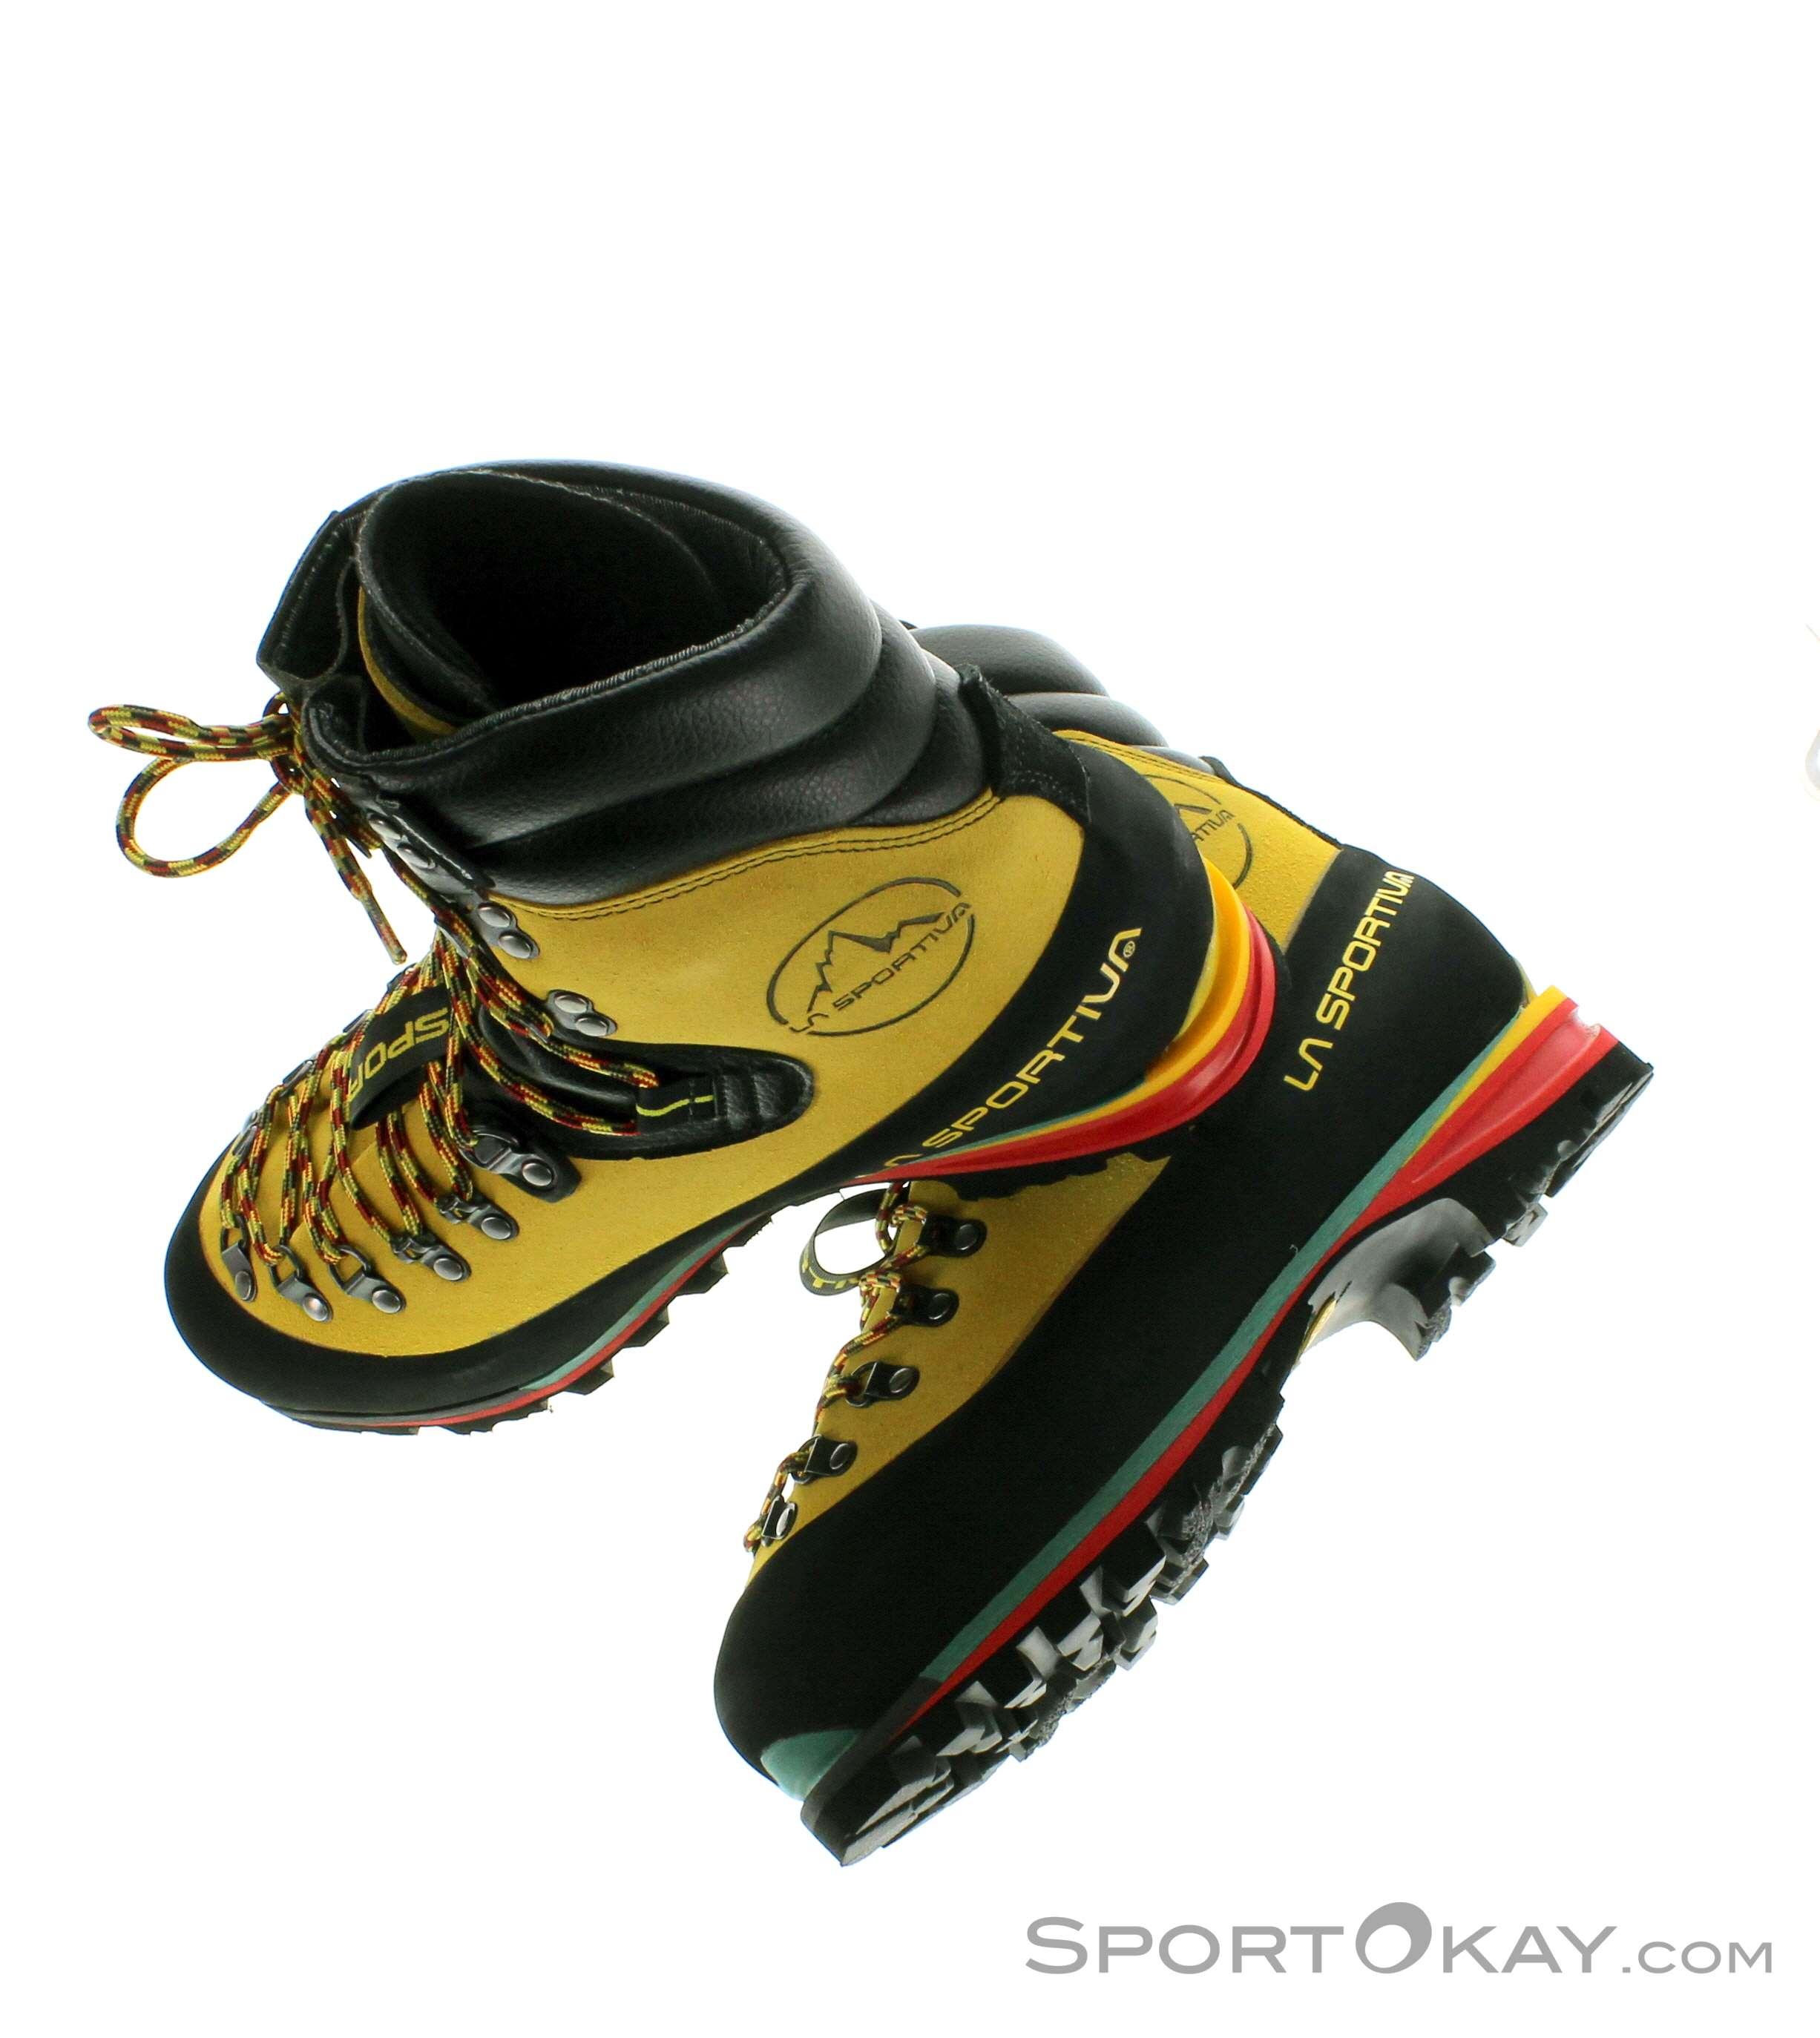 La Sportiva Nepal Extreme Uomo Scarpe da Montagna - Scarpe da ... 58f5425bb8e